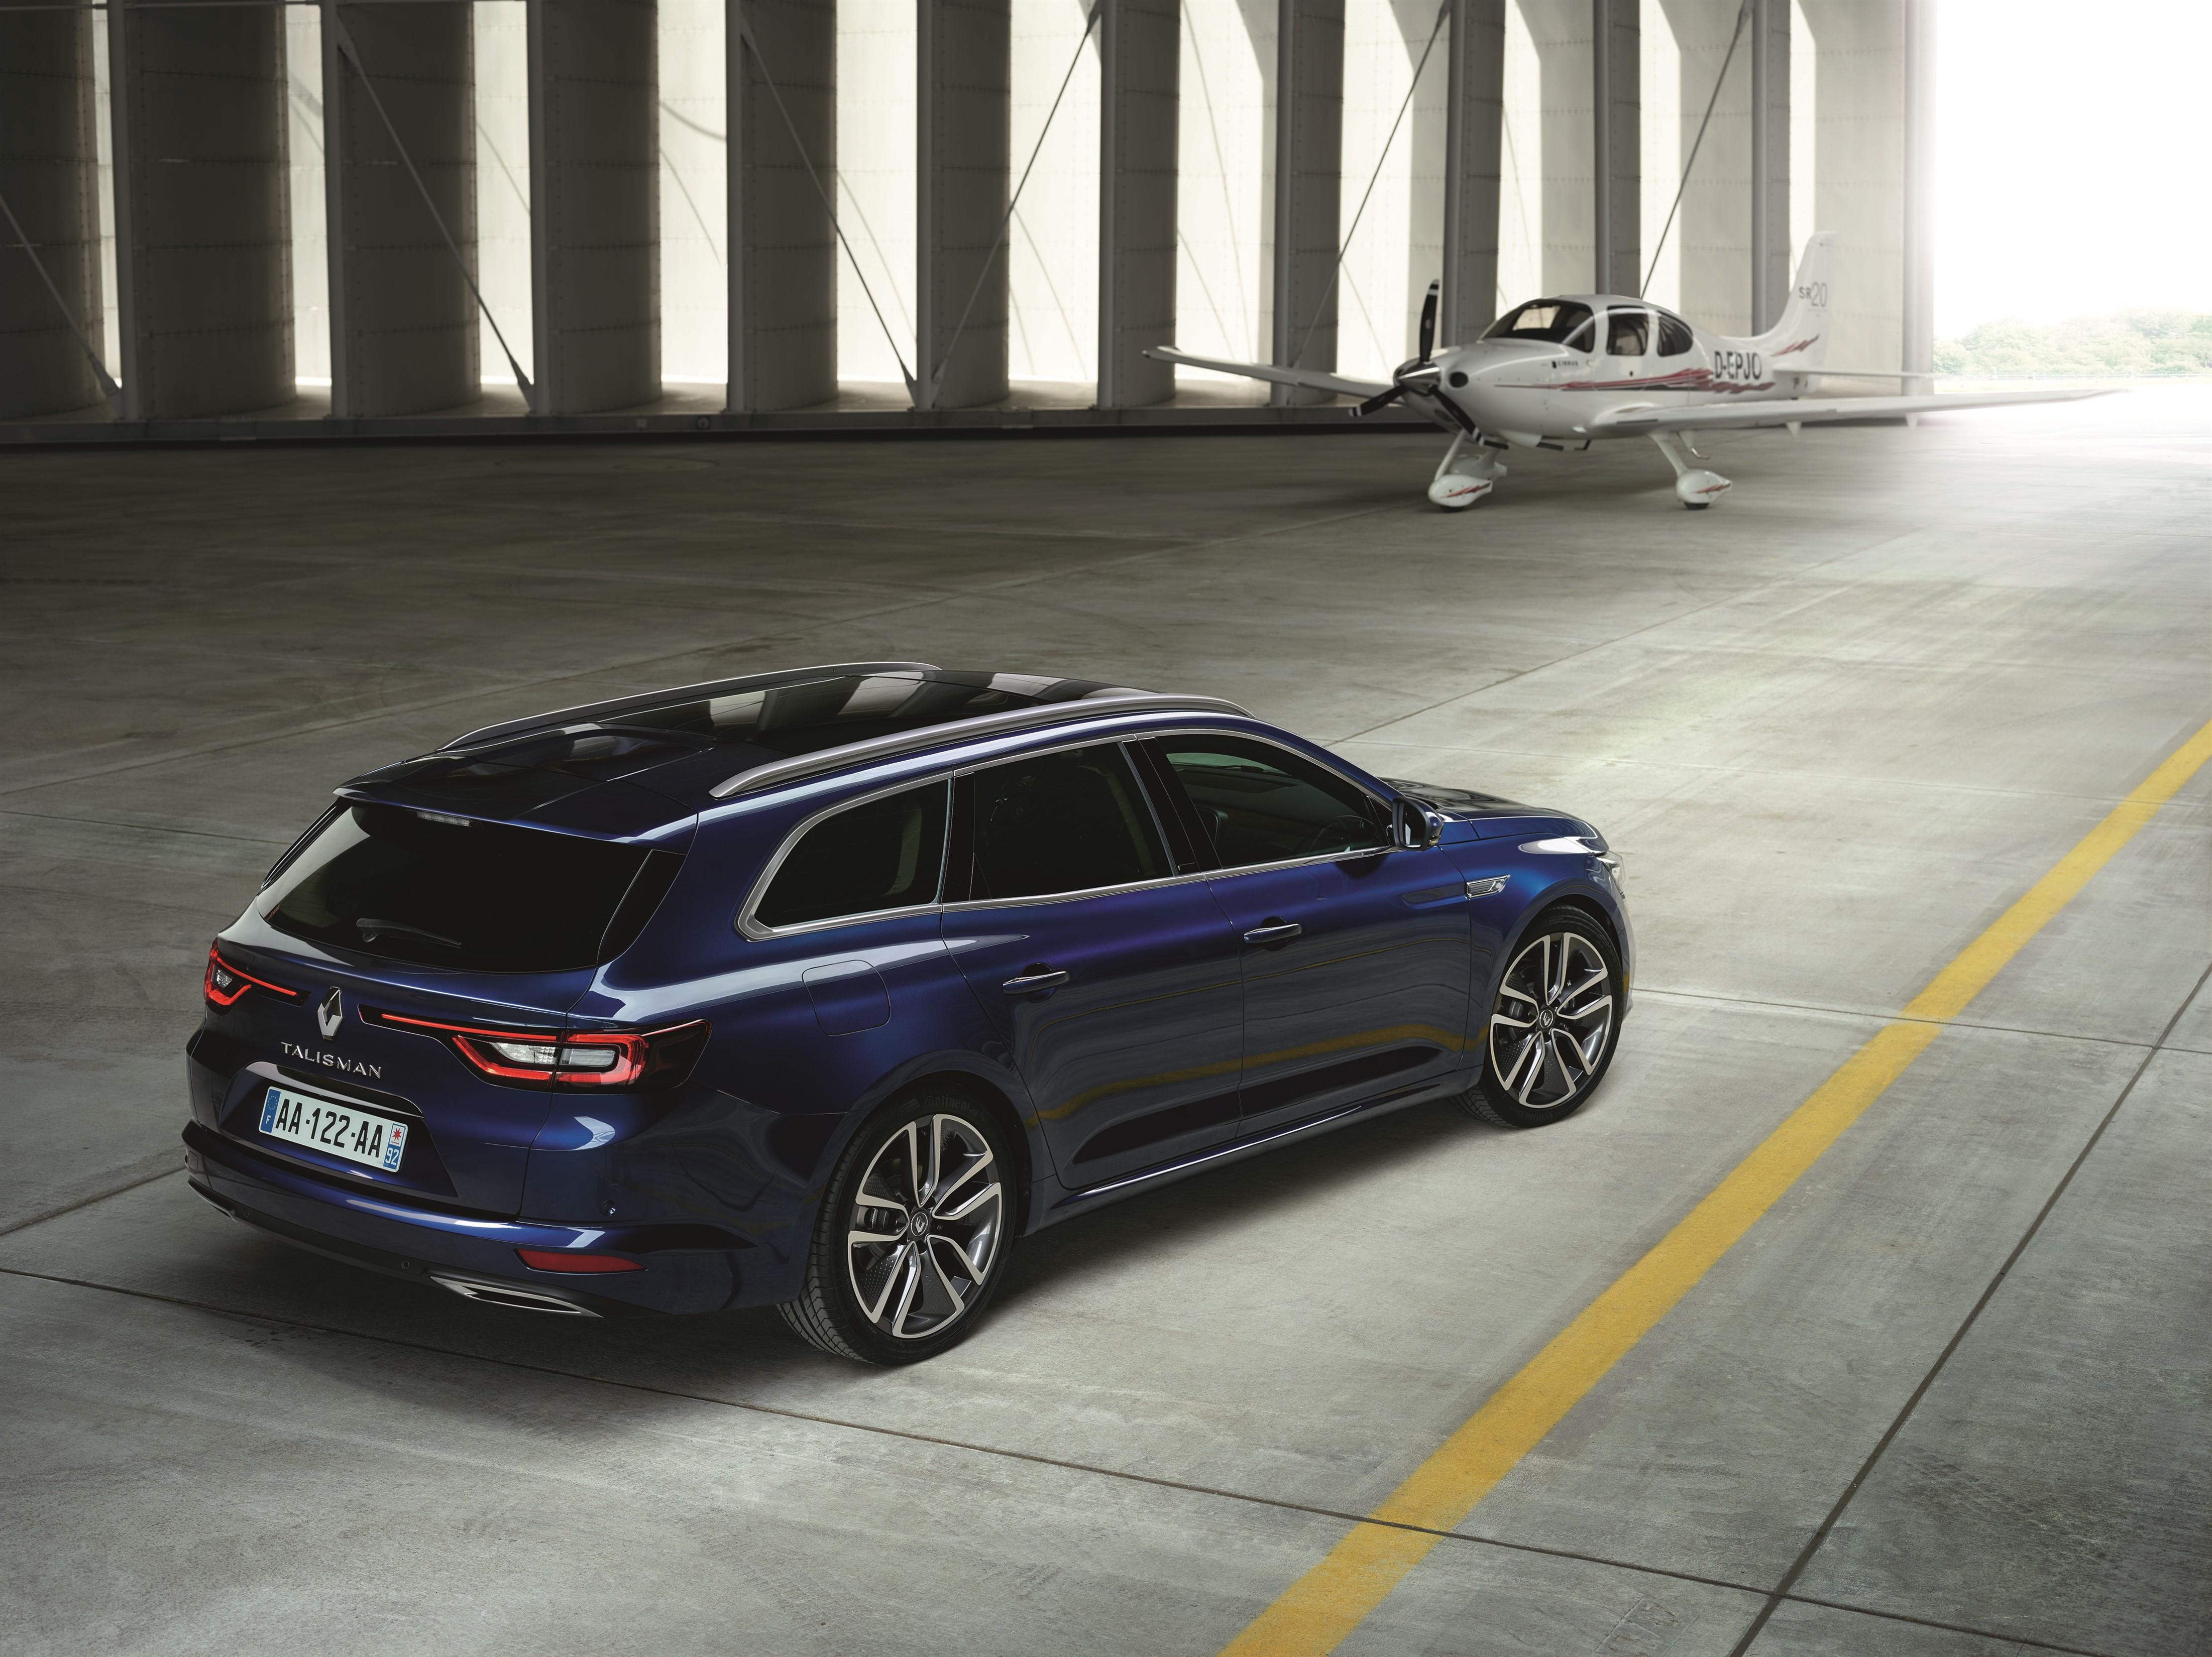 Renault svela la nuova Talisman Sporter